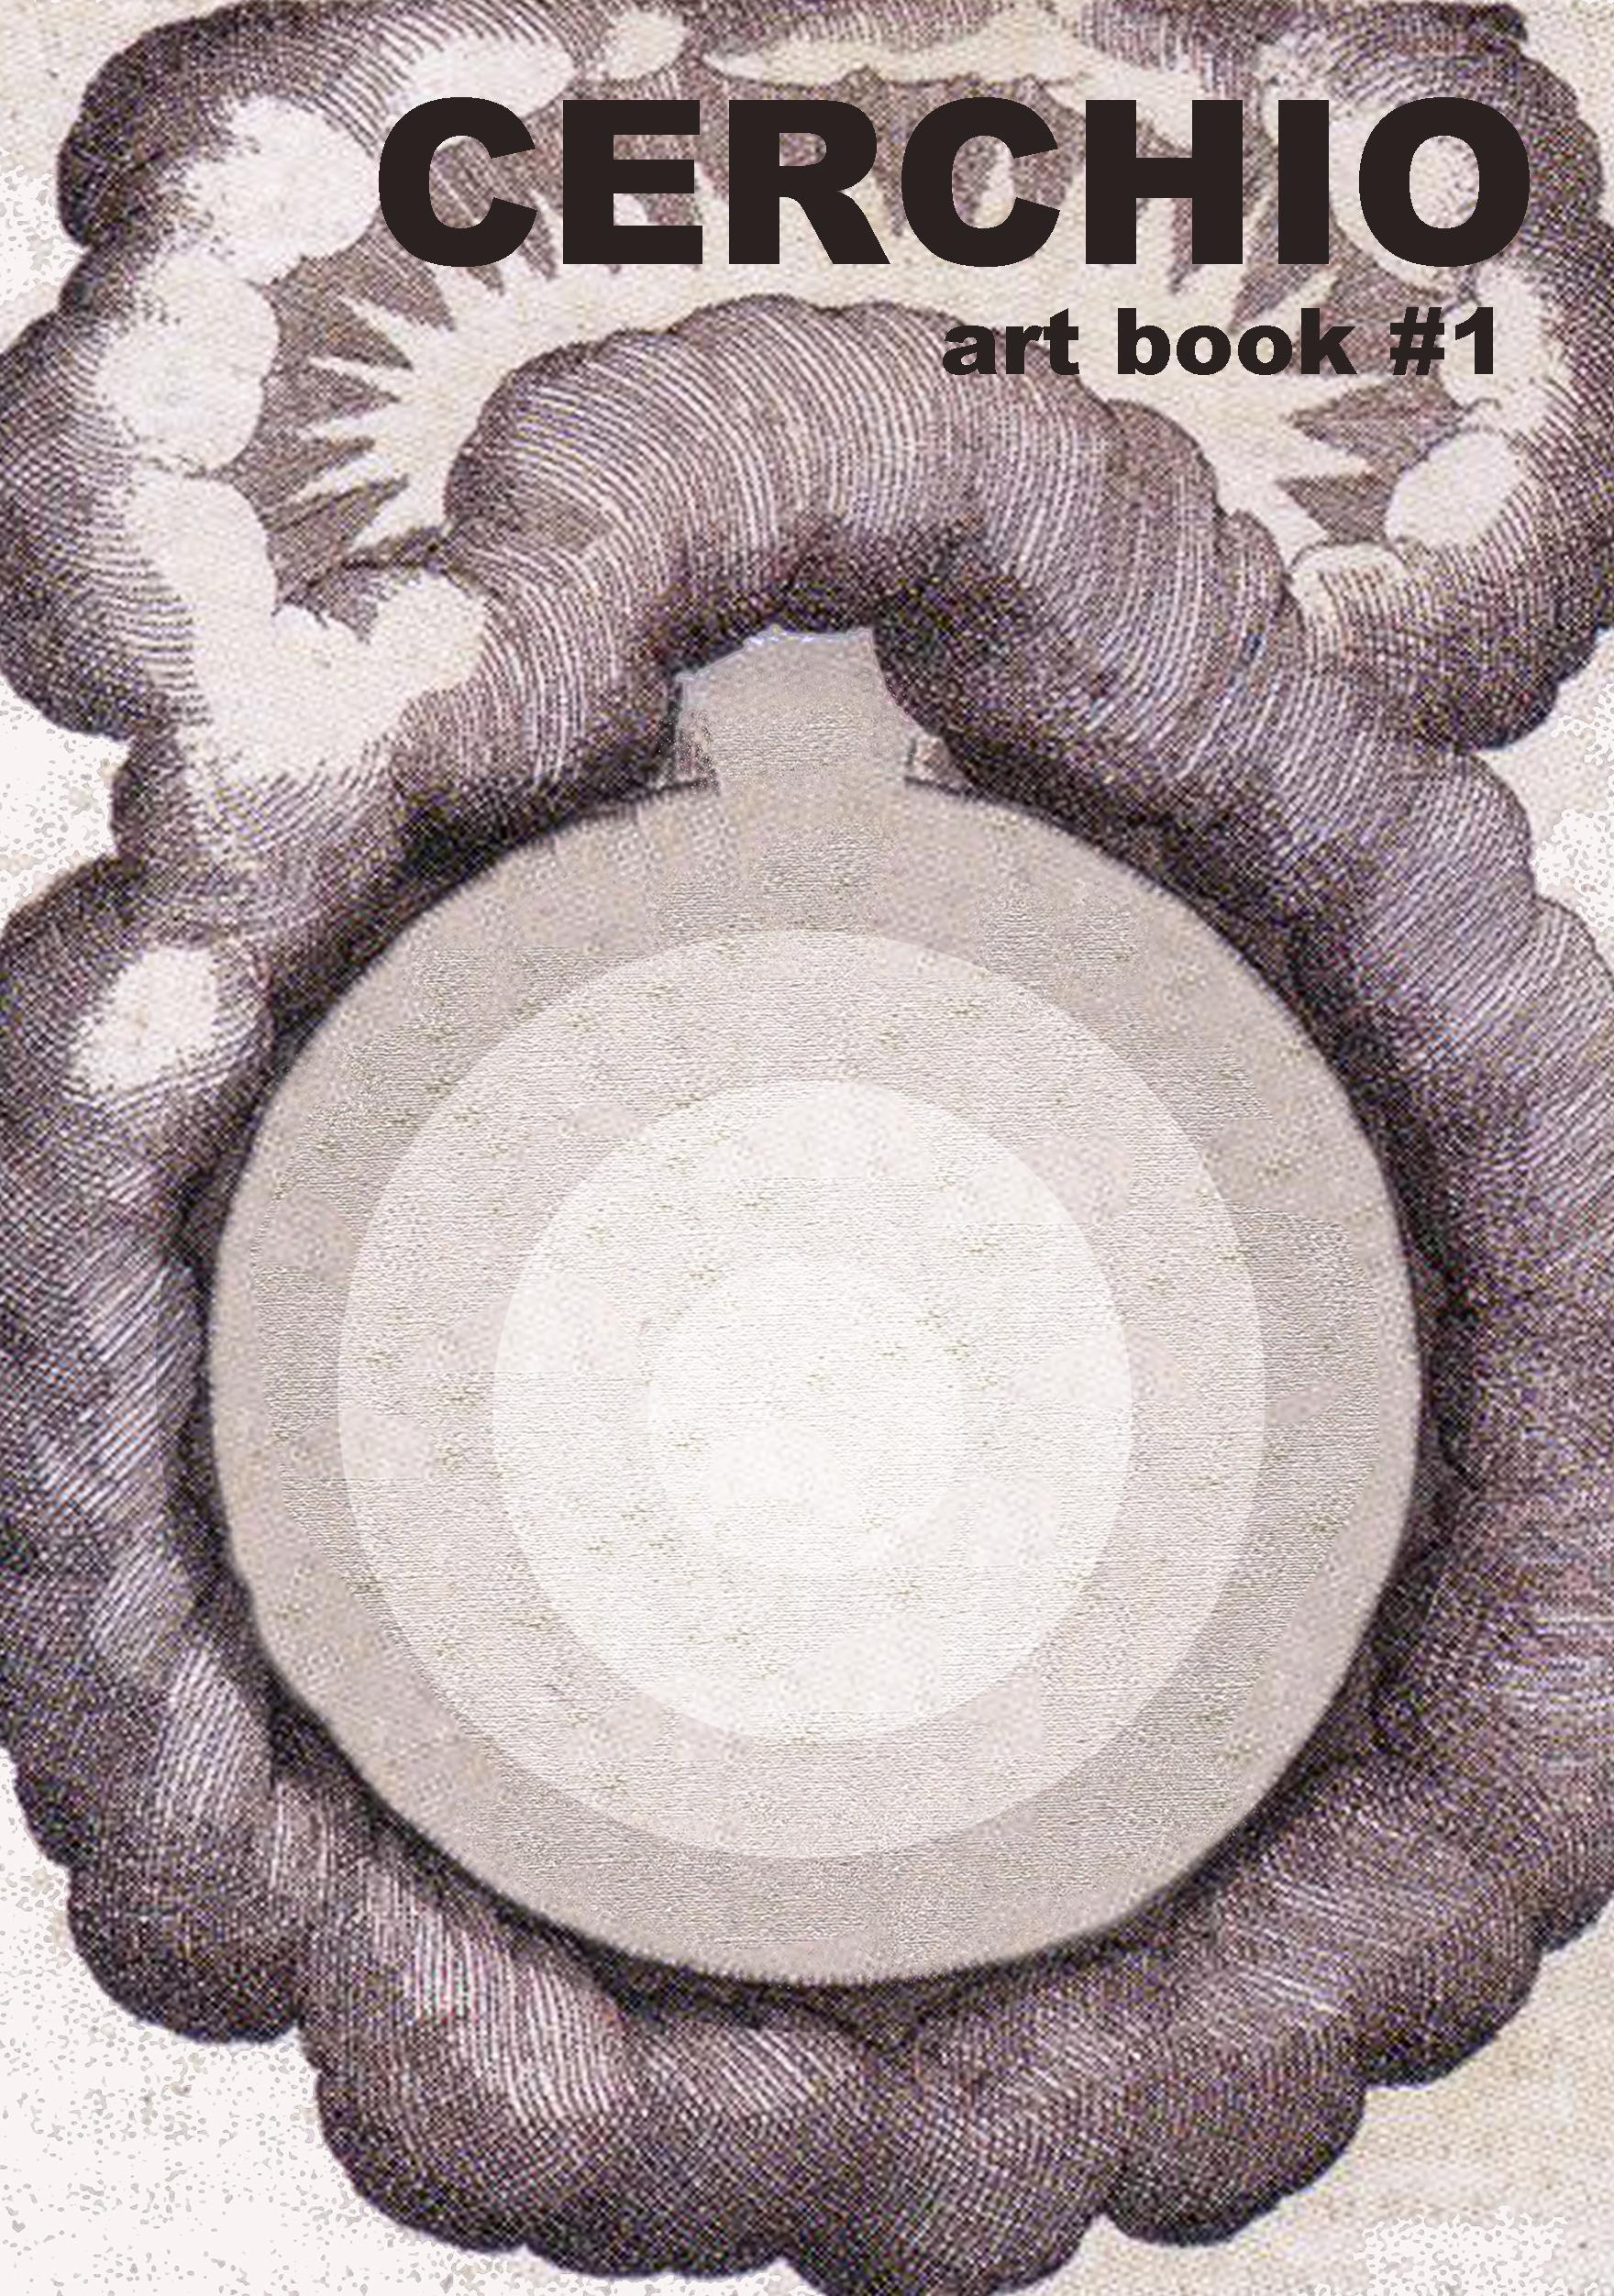 1 cerchio art book copertina